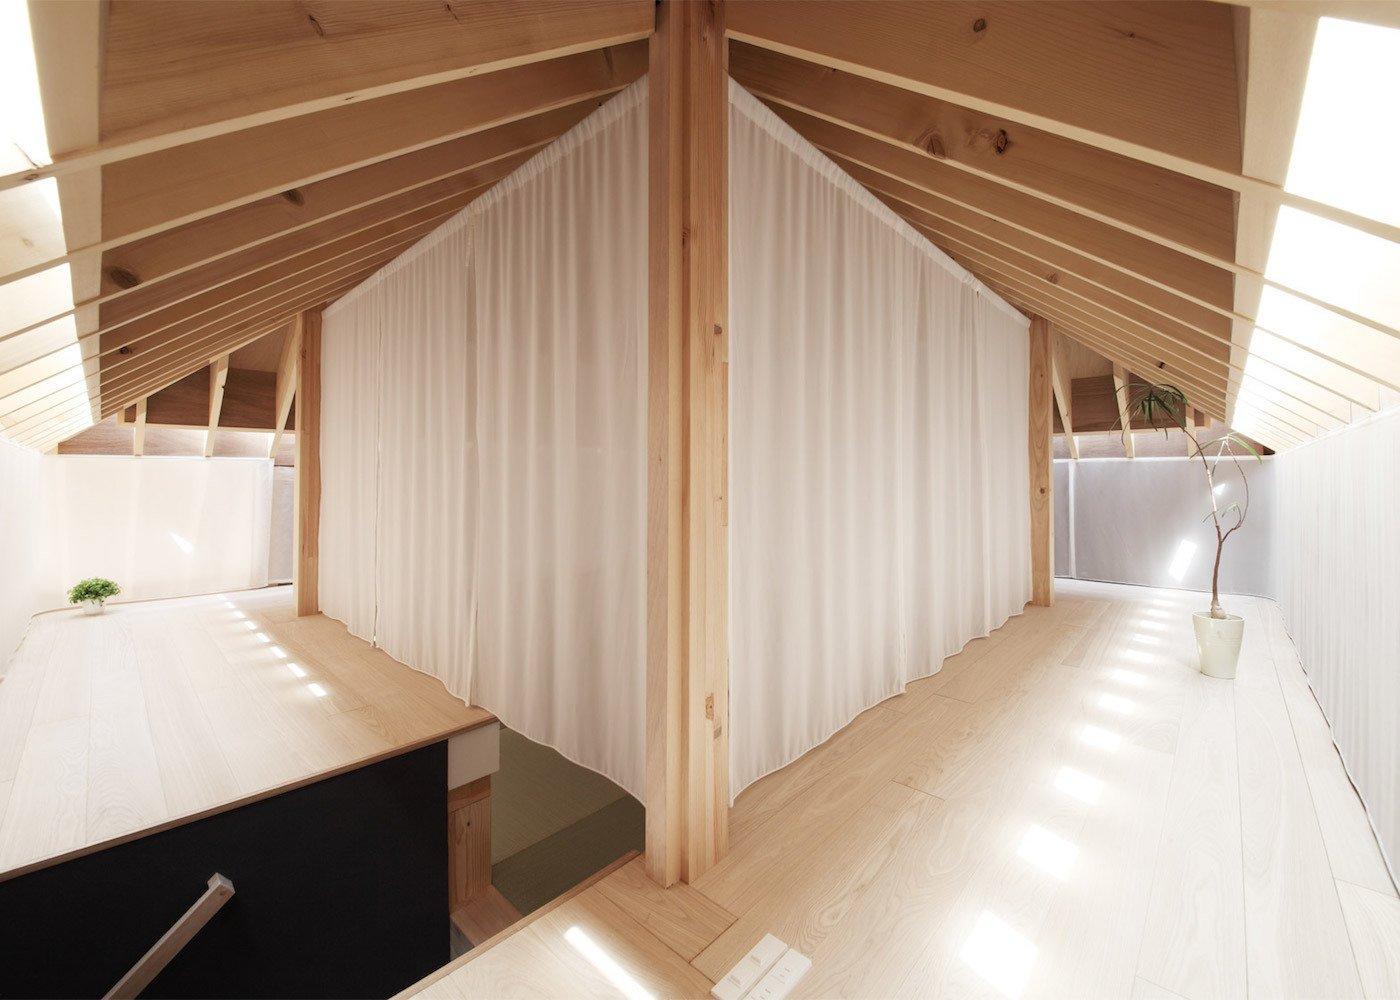 Unabashedly Strange Houses in Japan from Wengawa House by Katsutoshi Sasaki + Associates